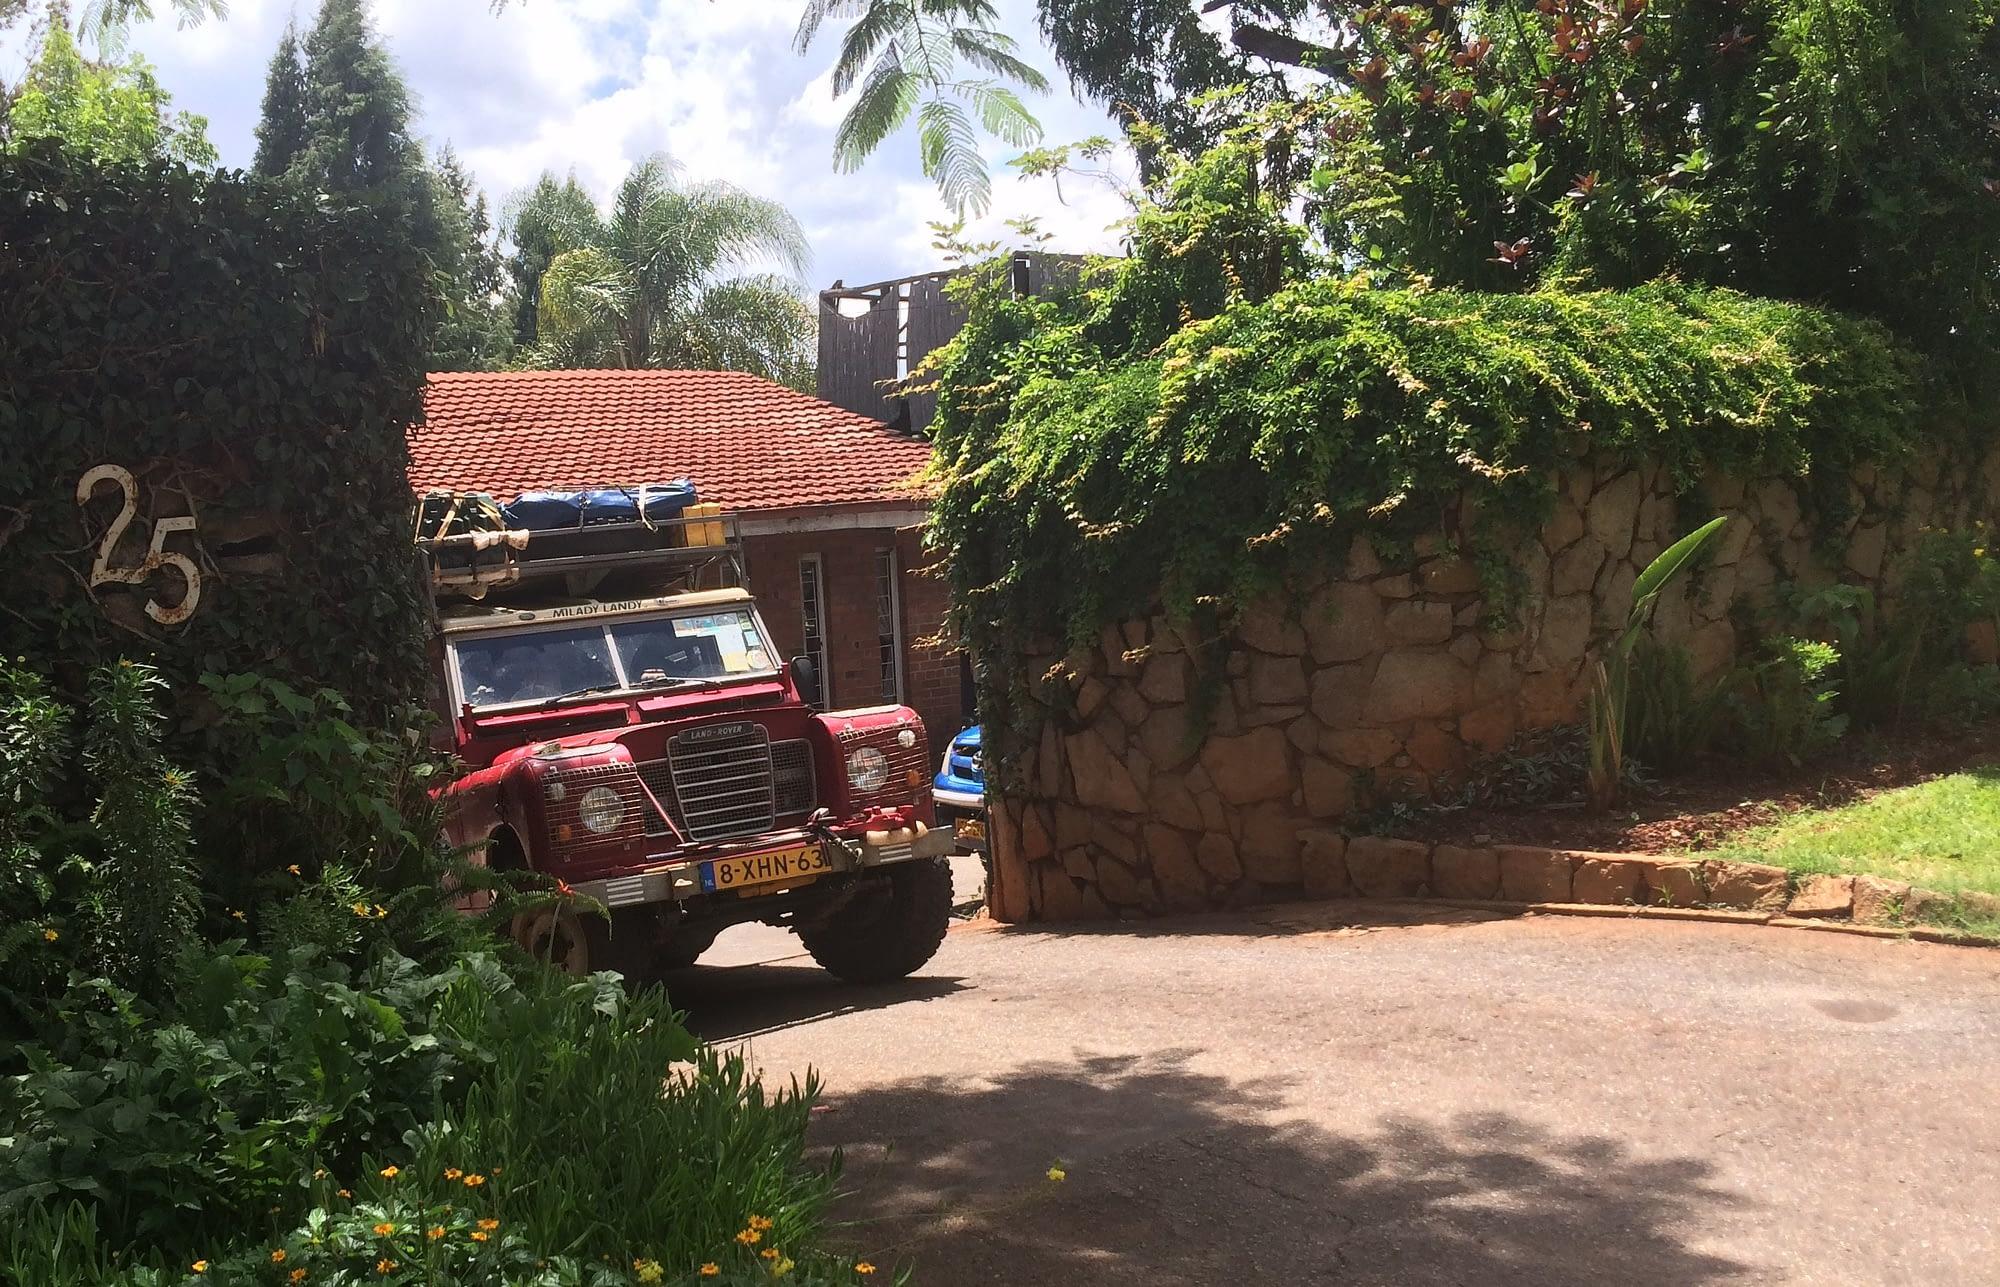 Milady Landy at It's a Small World Backpackers Lodge Harare, Zimbabwe